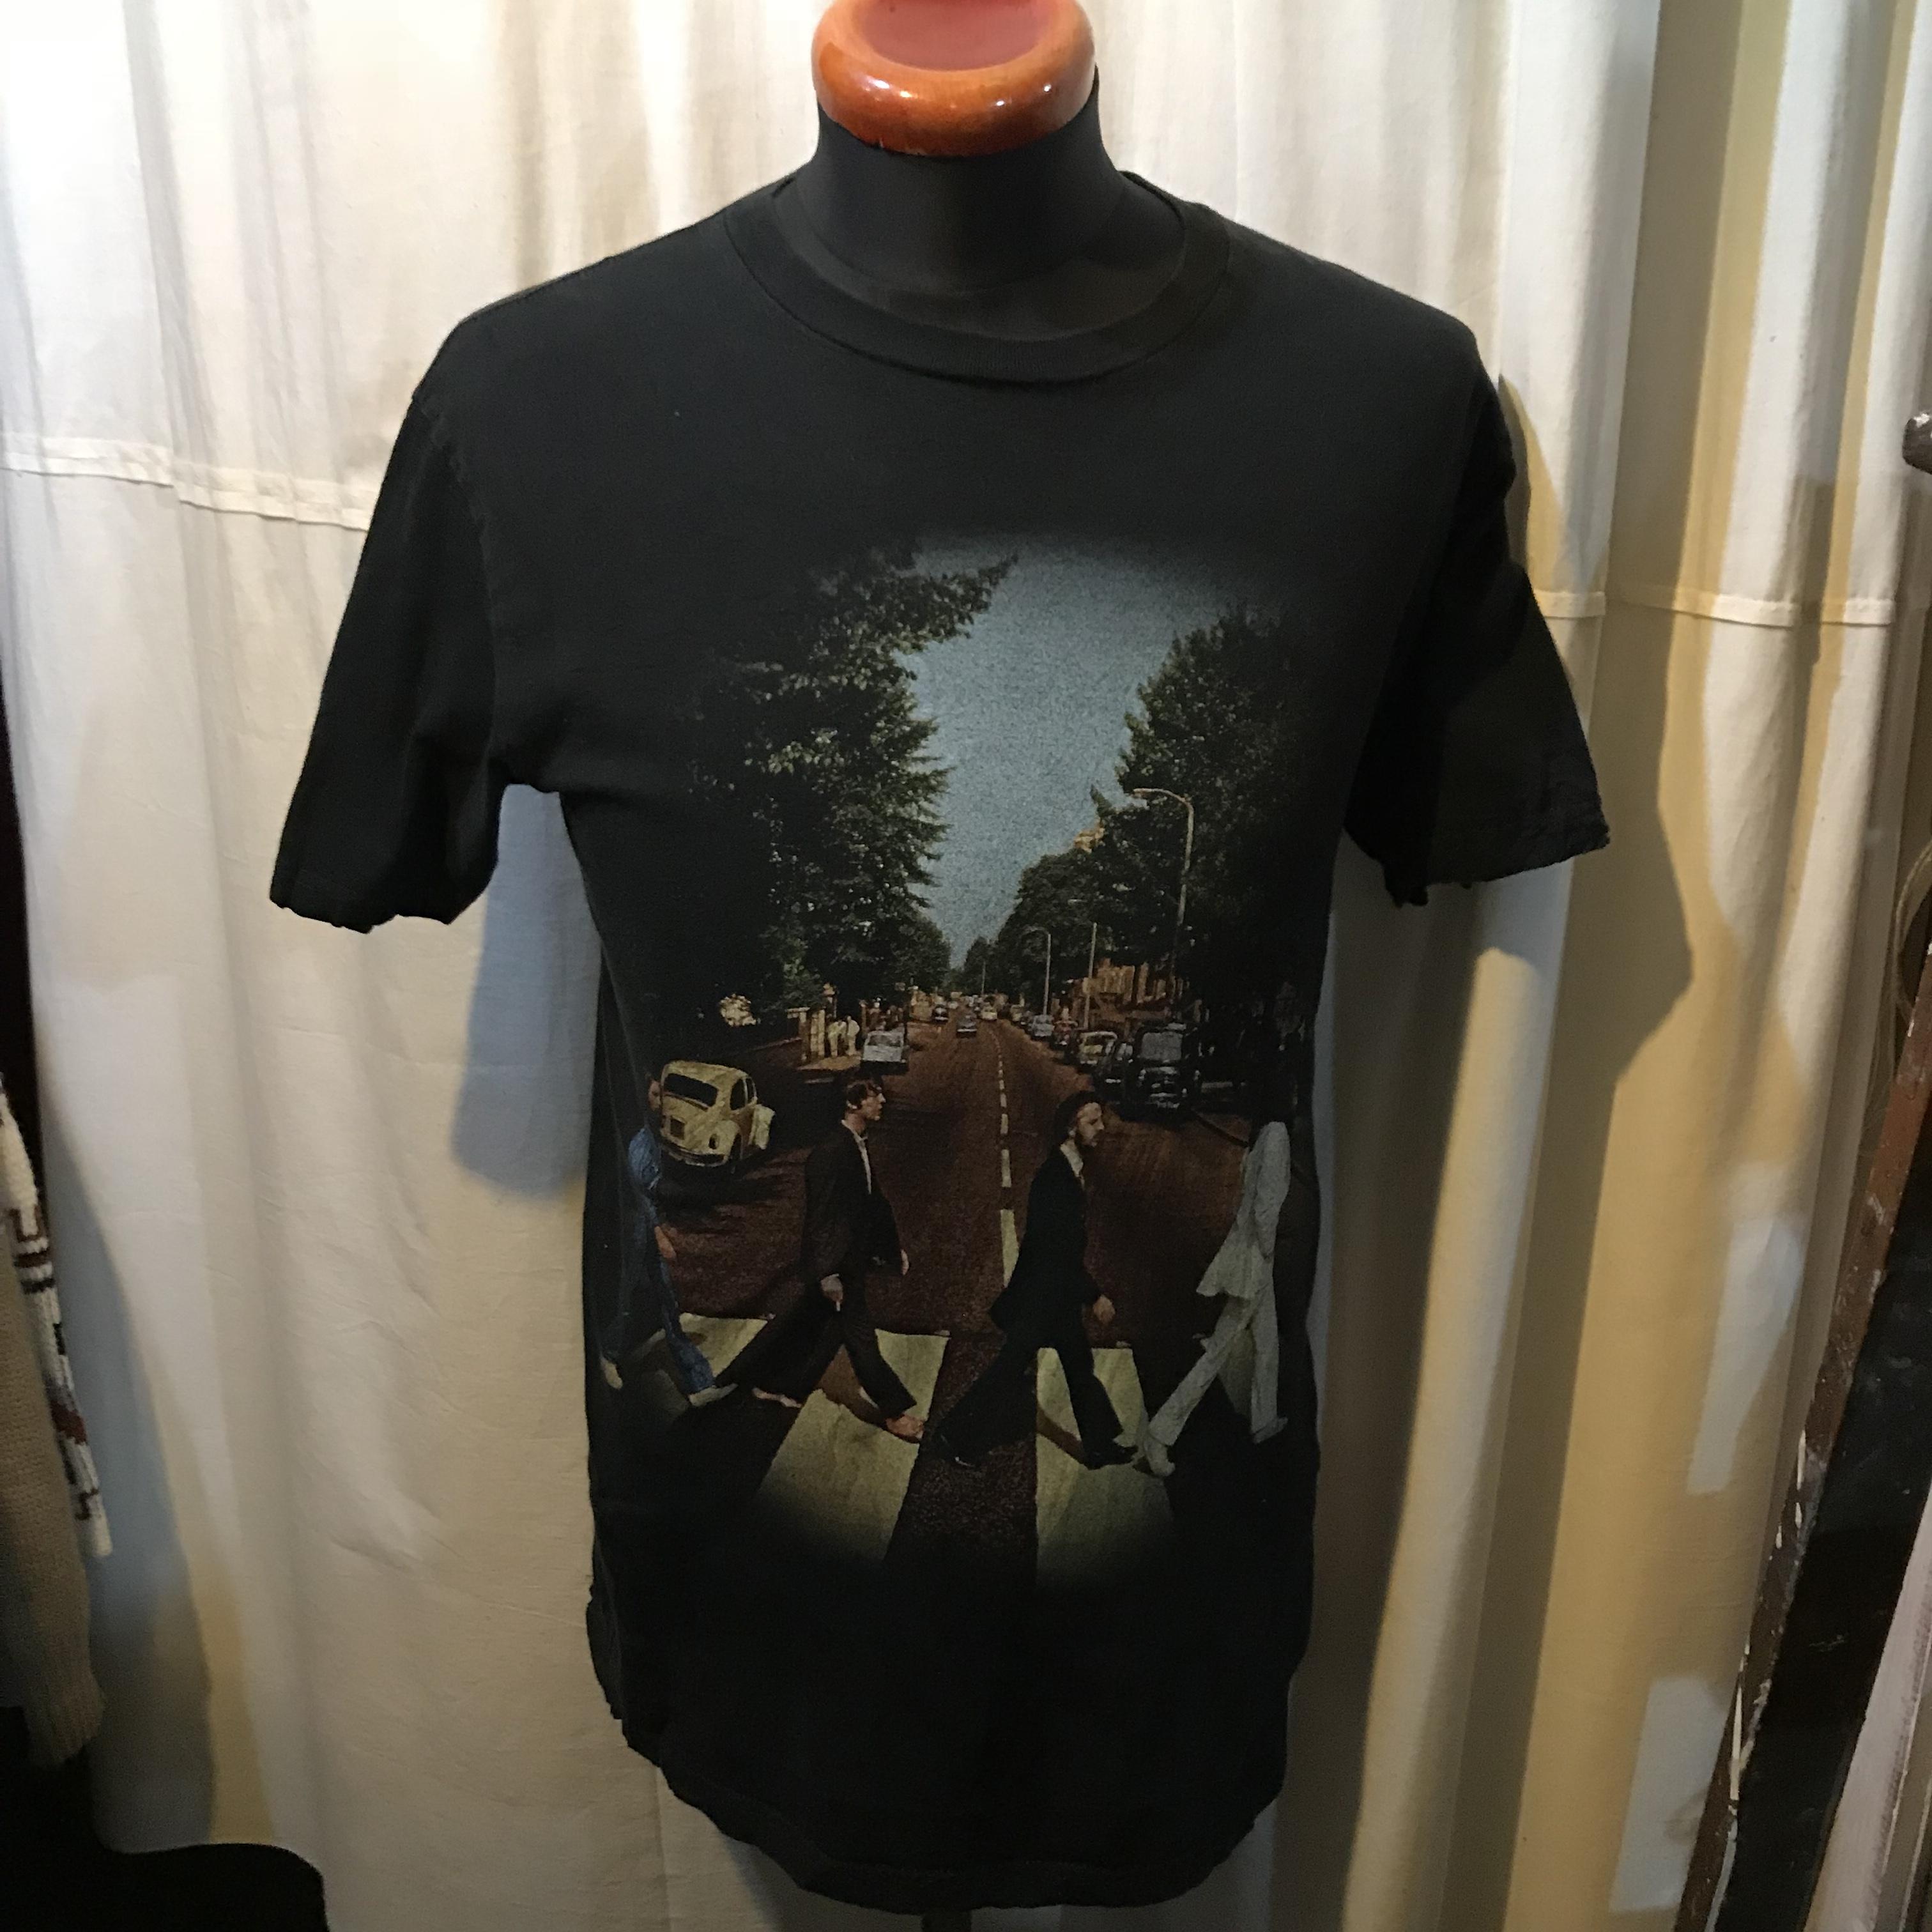 THE BEATLES ビートルズ アビーロード 半袖Tシャツ メンズM